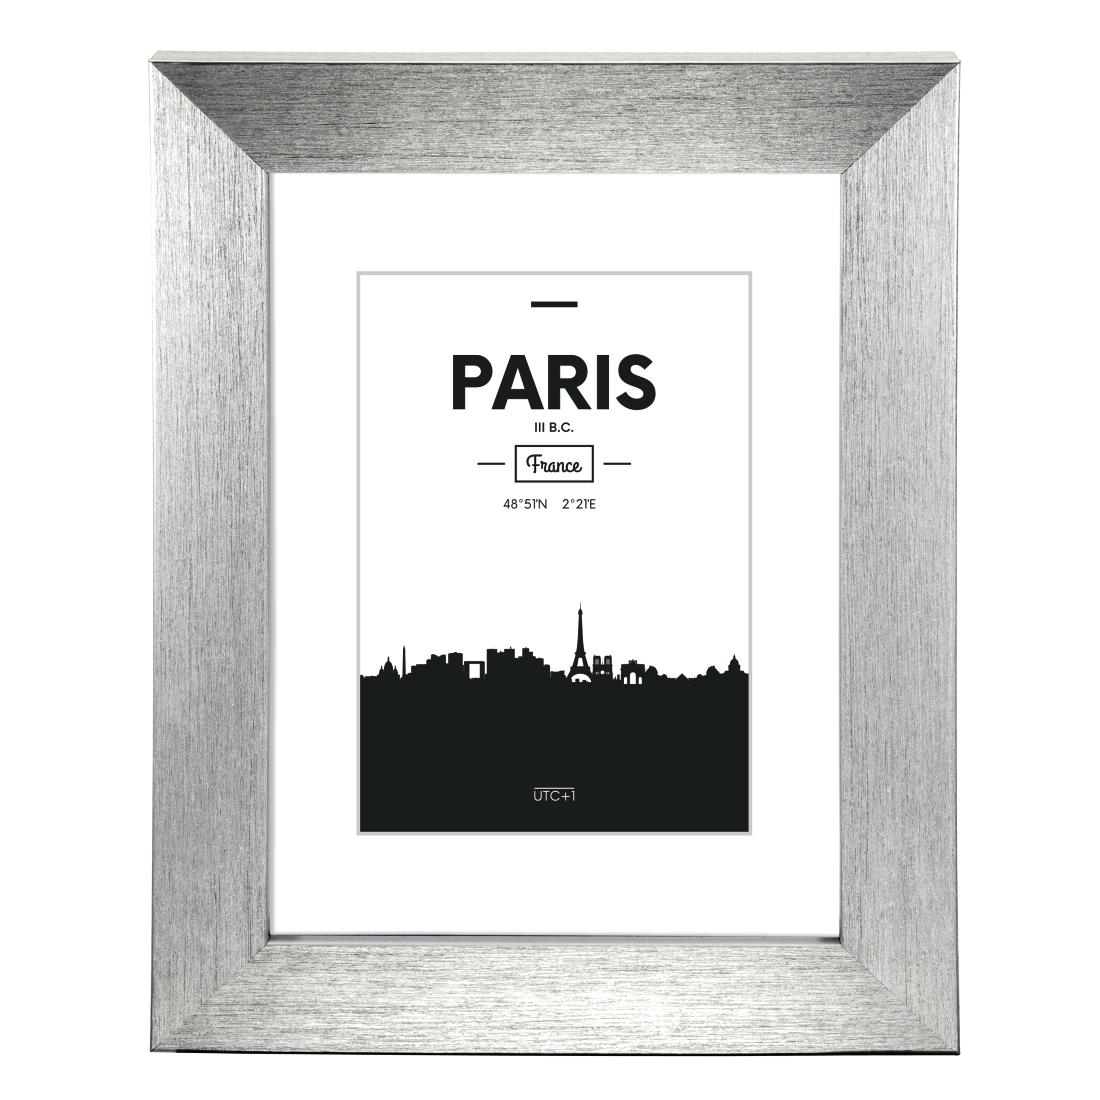 00126049 Hama Paris Plastic Frame Silver 20 X 30 Cm Hama De